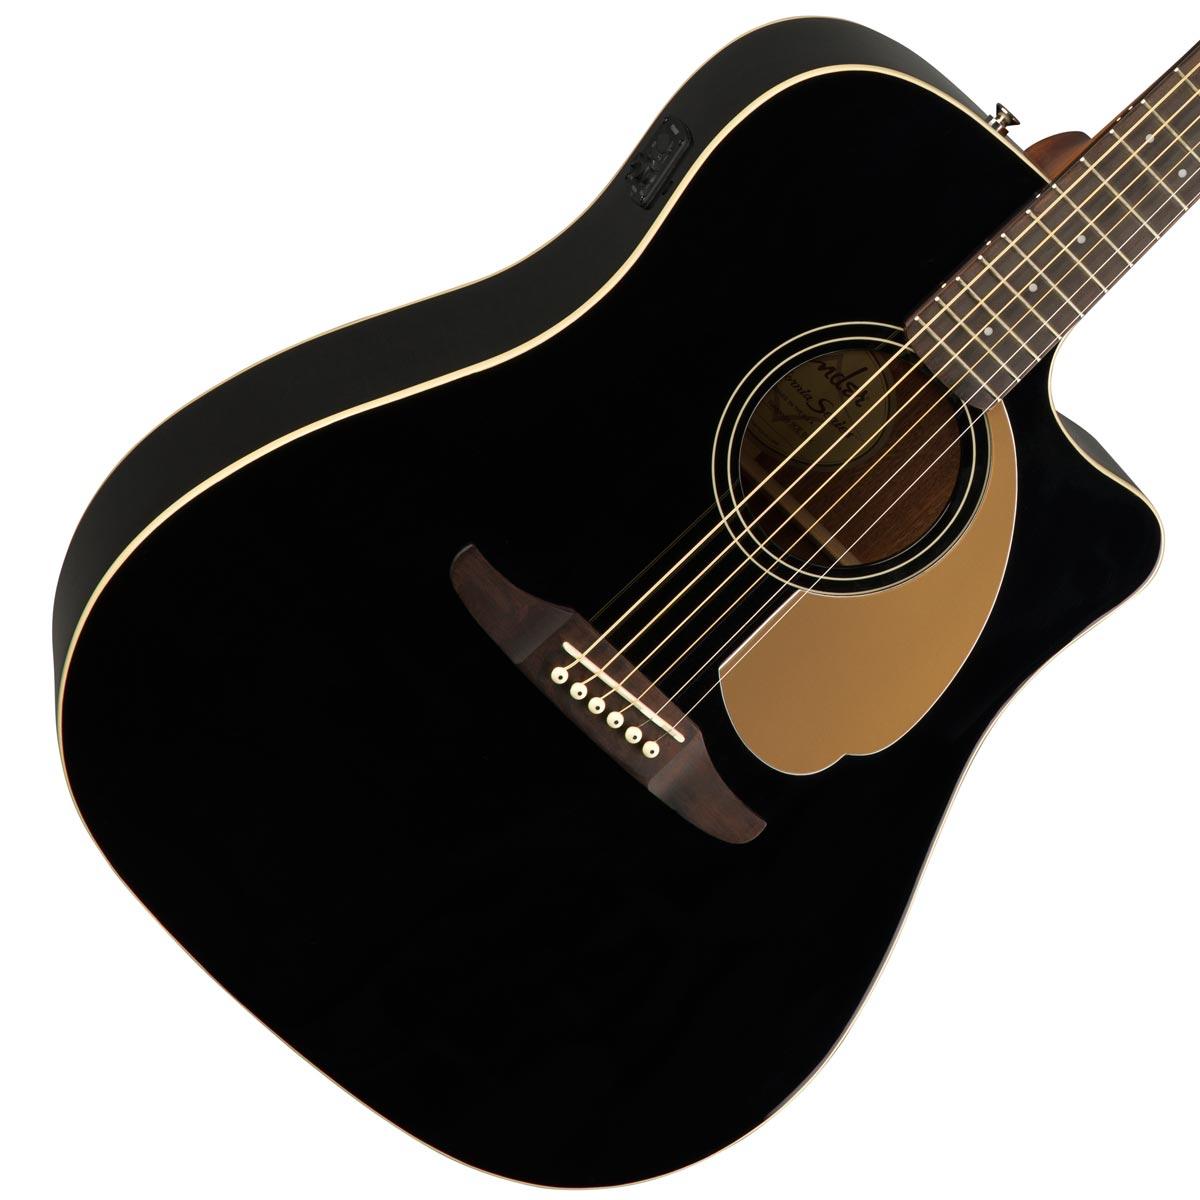 FENDER / REDONDO PLAYER Jetty Black (JTB) 【CALIFORNIA SERIES】フェンダー アコースティックギター【YRK】